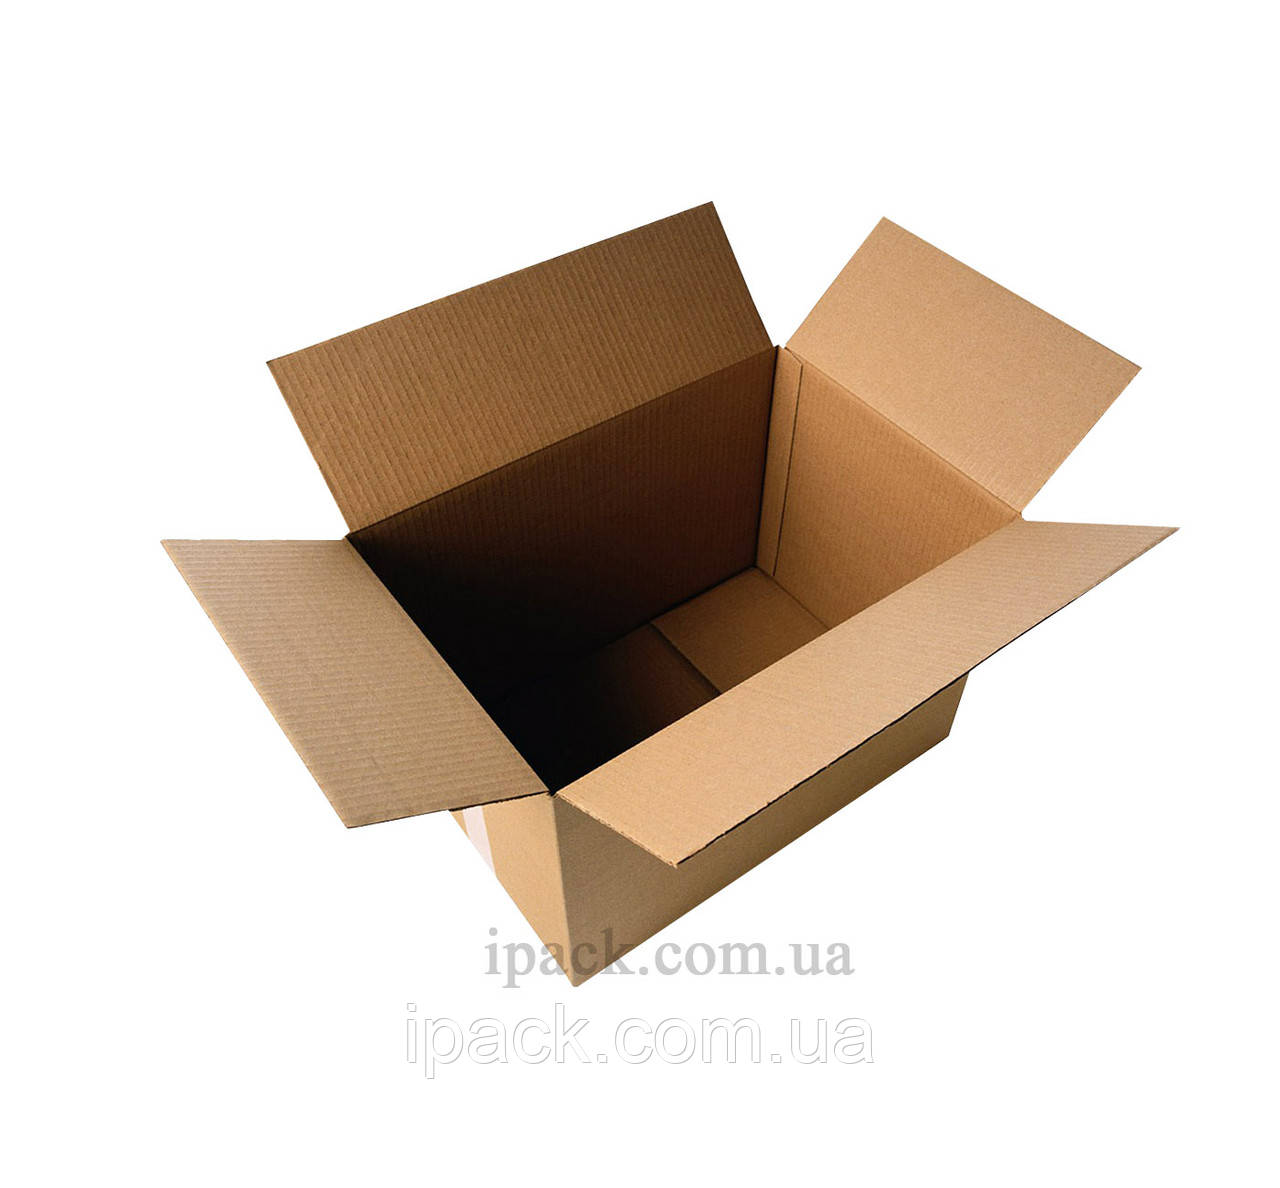 Гофроящик 260*190*90 мм, бурый, четырехклапанный картонный короб